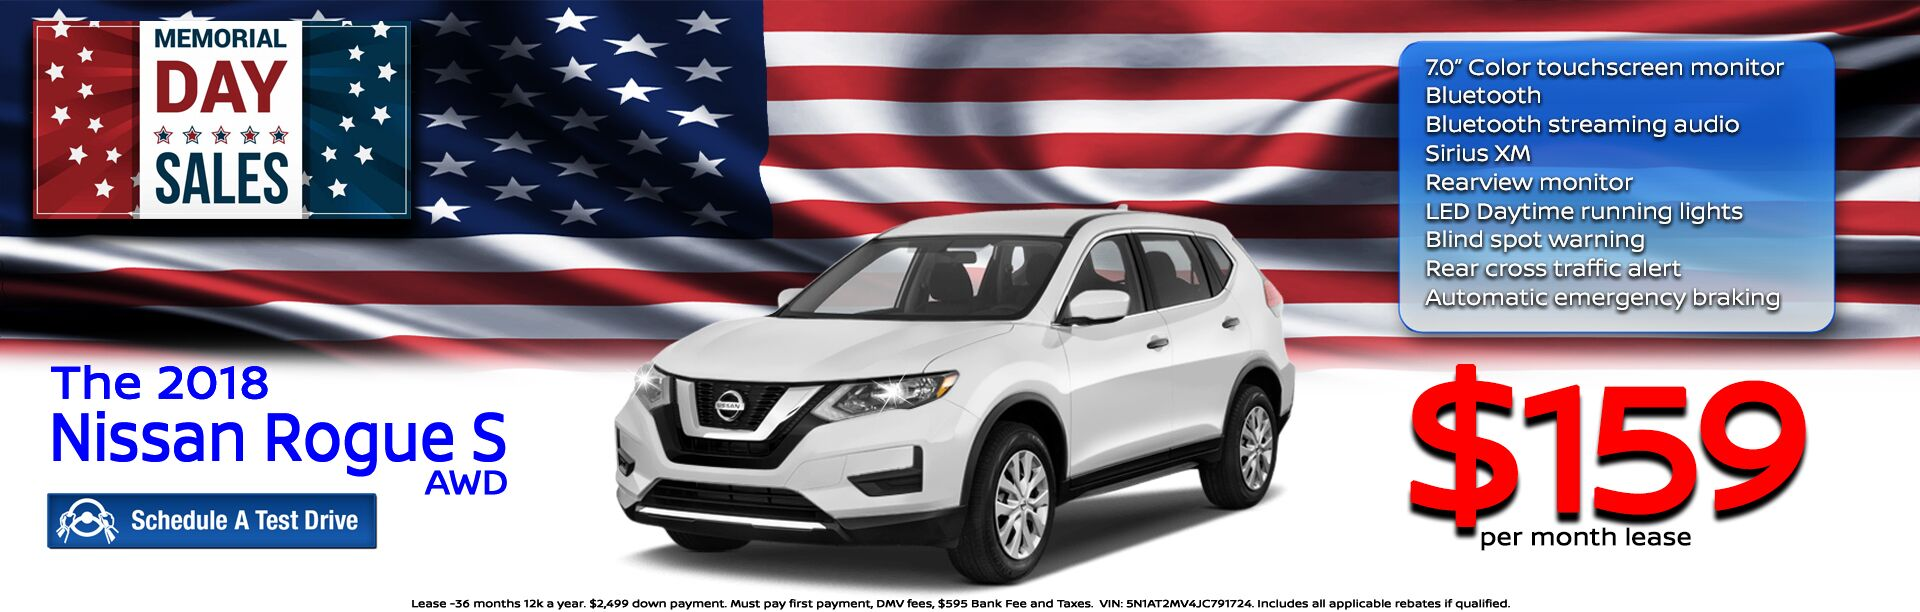 Nissan Dealership Wappingers Falls Ny Used Cars